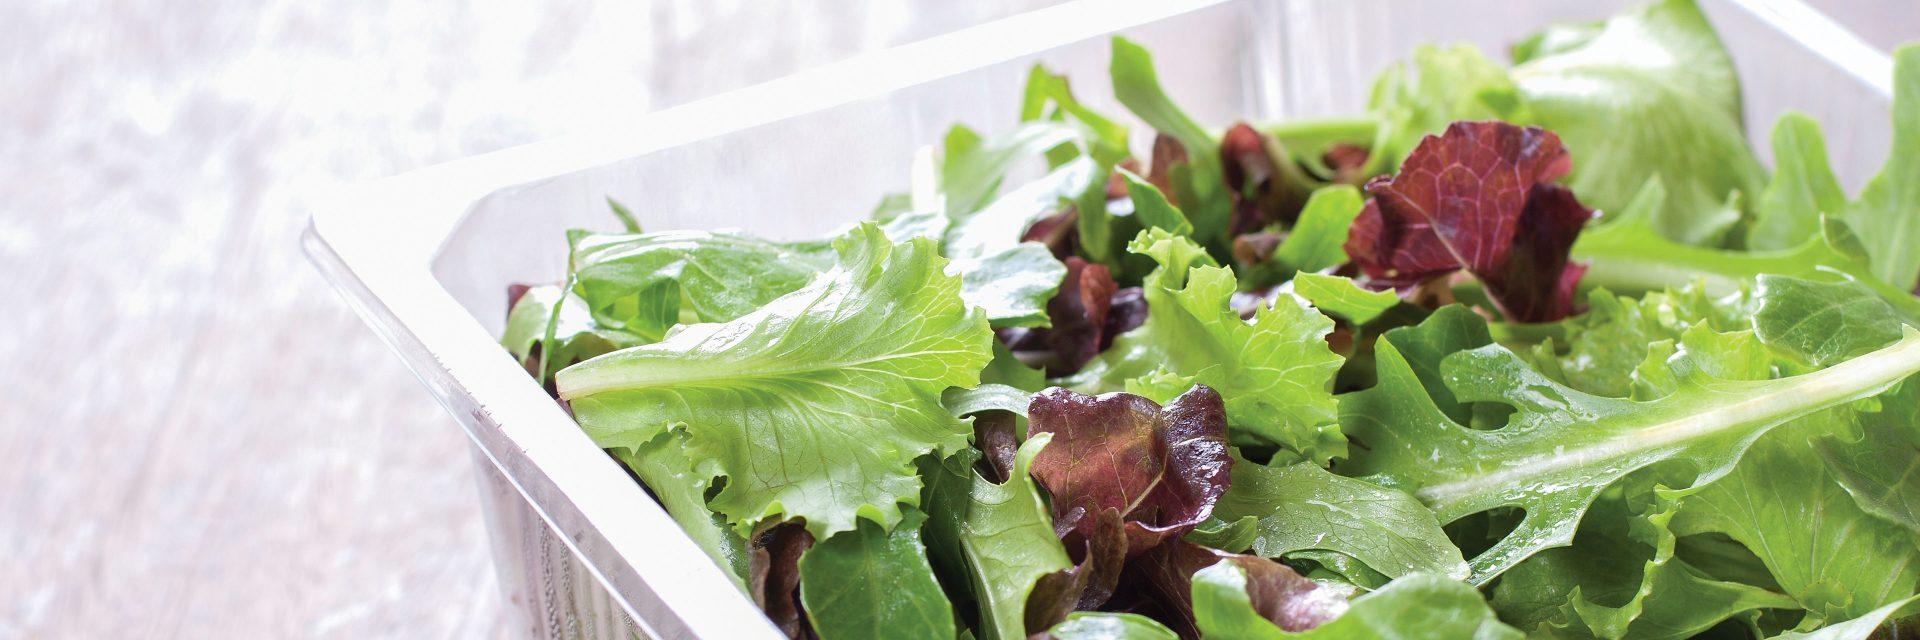 Food Processing Plants Study + Design